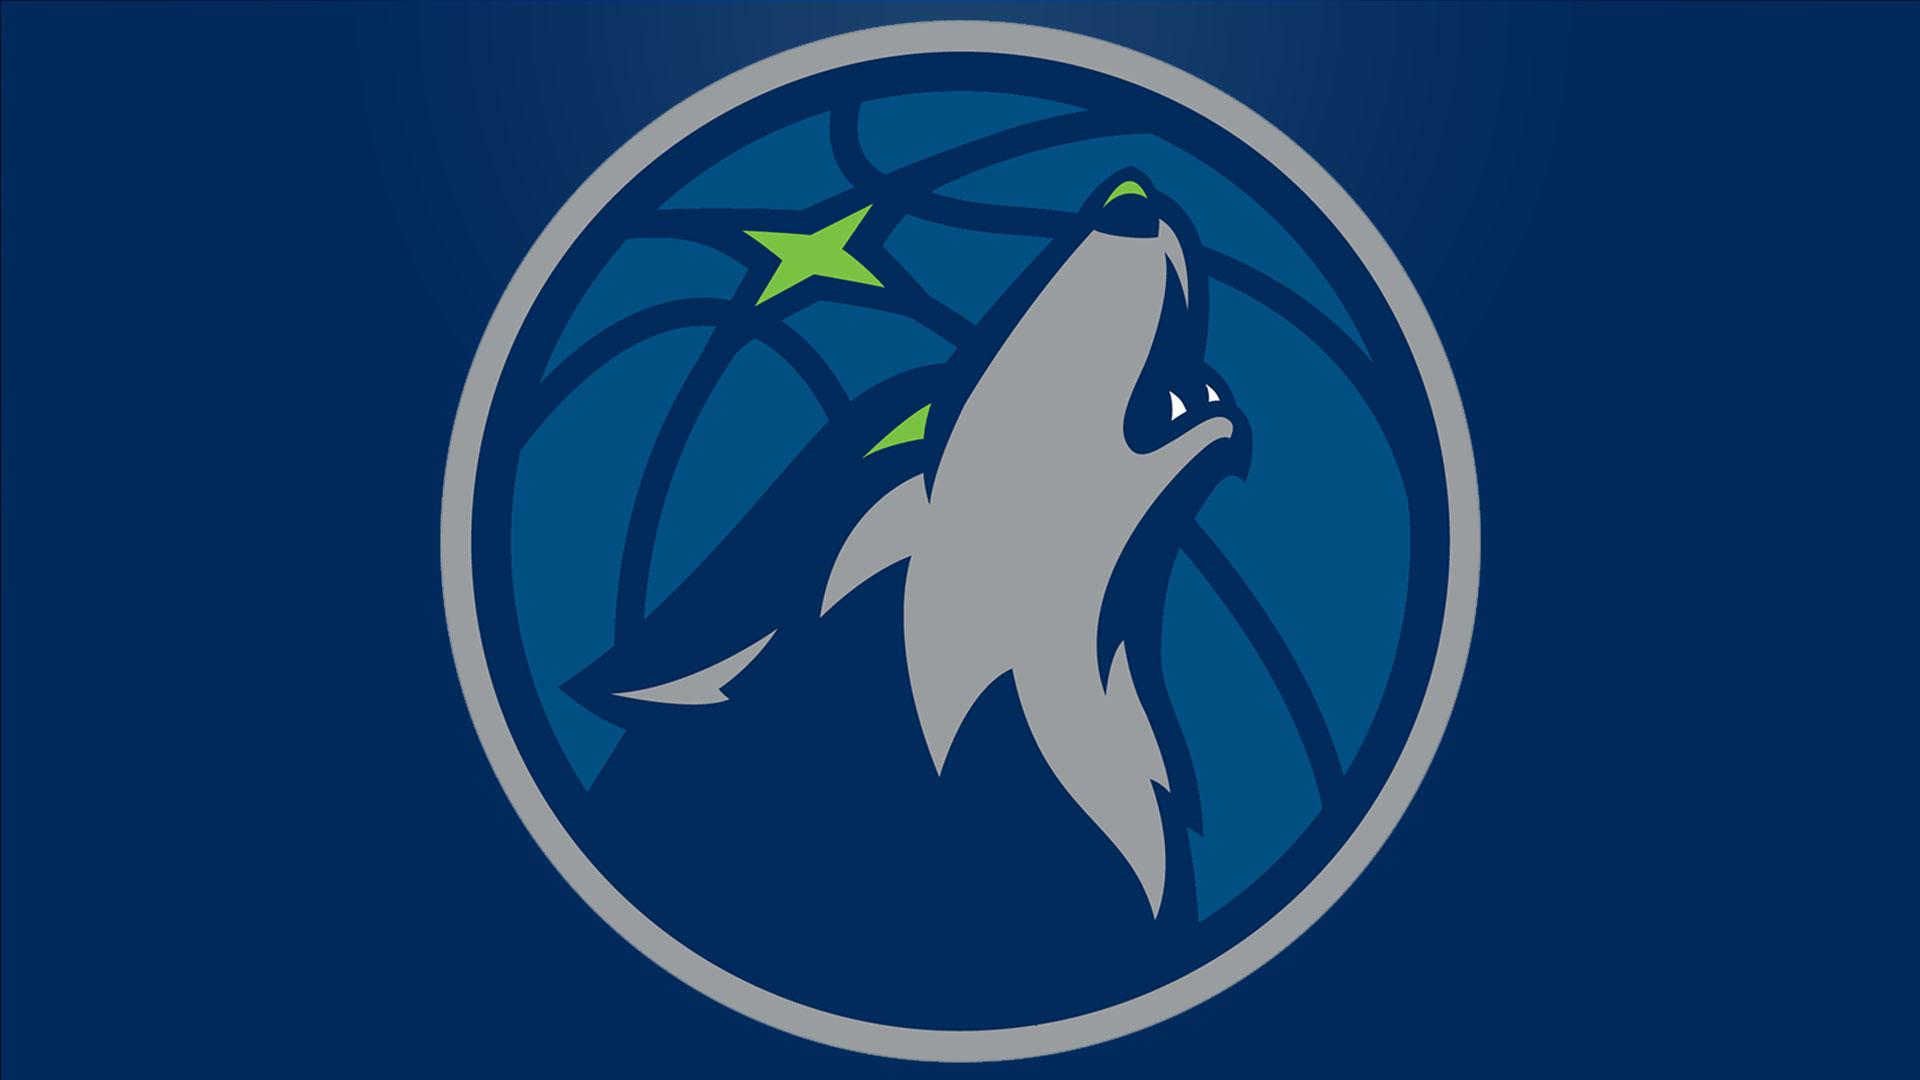 KELO-Minnesota-Timberwolves-alternate_1529375689476.jpg